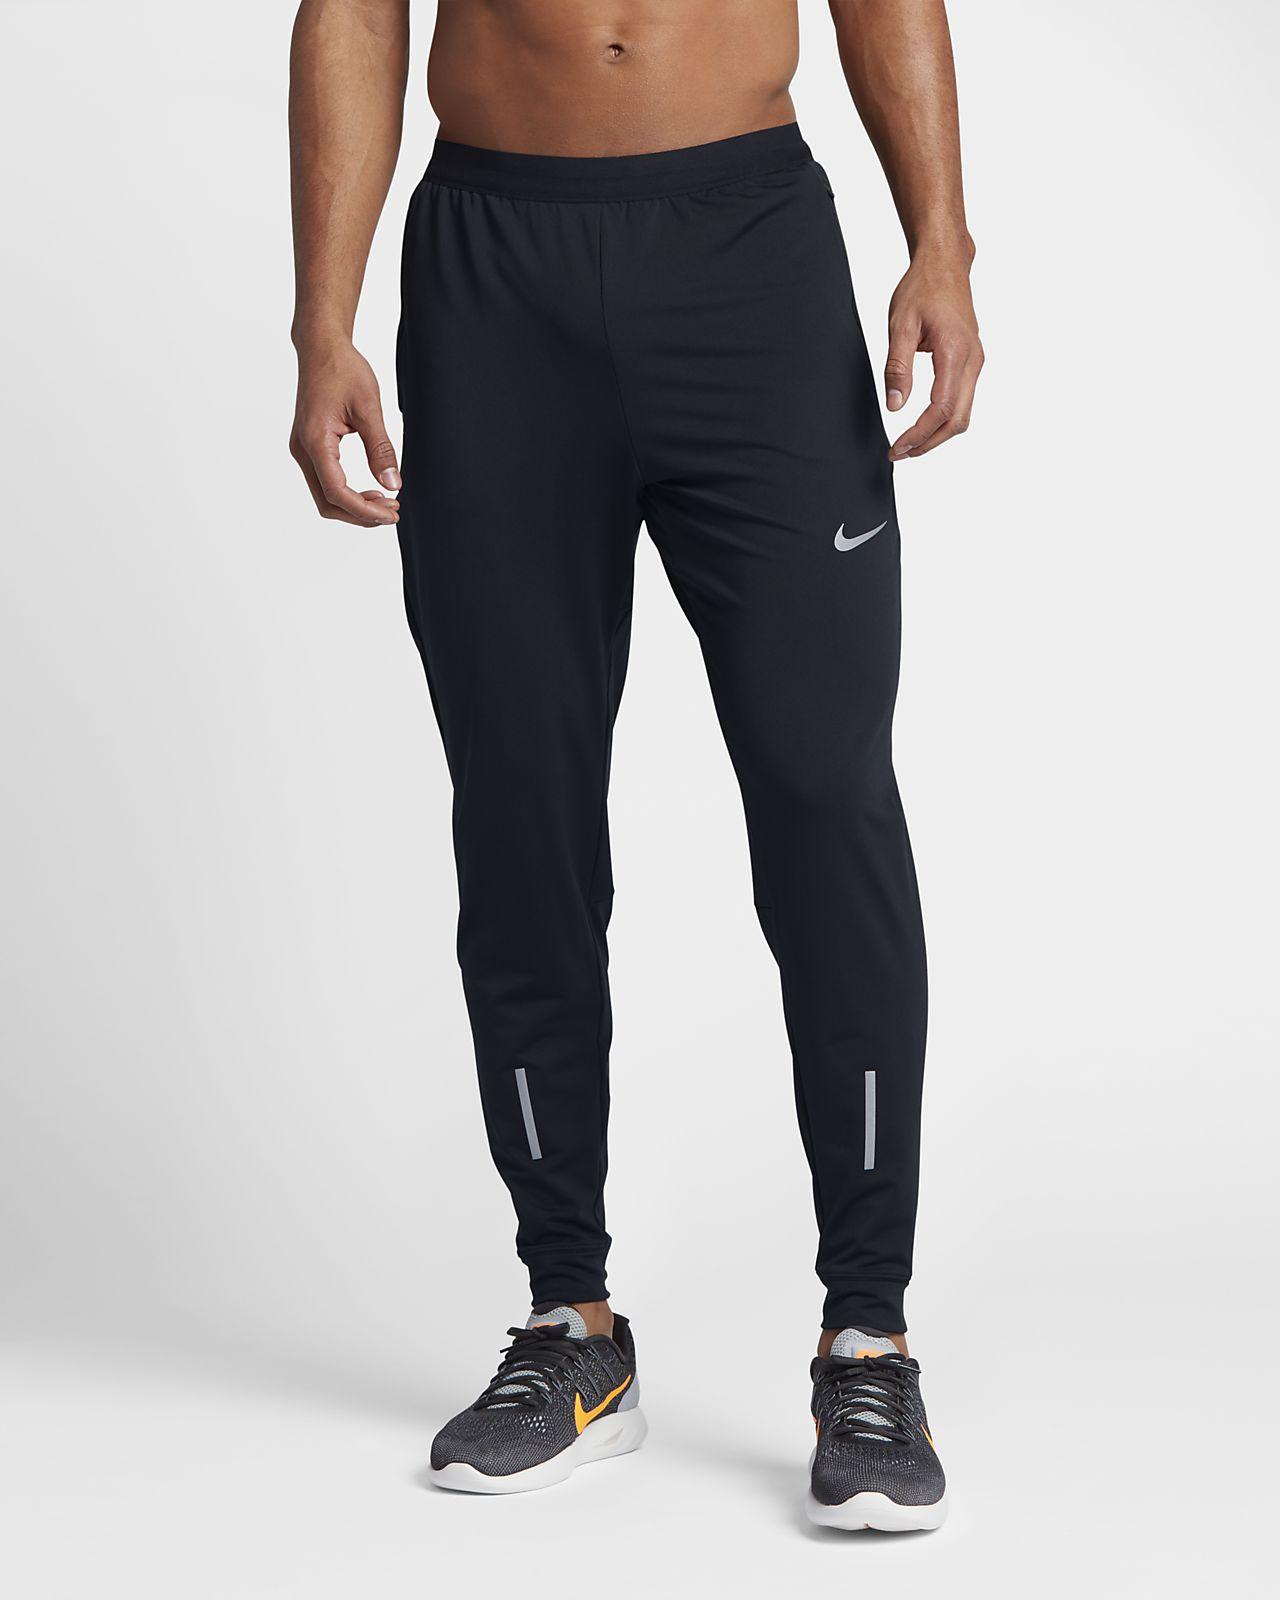 b8a323266736 Nike Dri-FIT Phenom Herren-Laufhose (ca. 73,5 cm). Nike.com DE